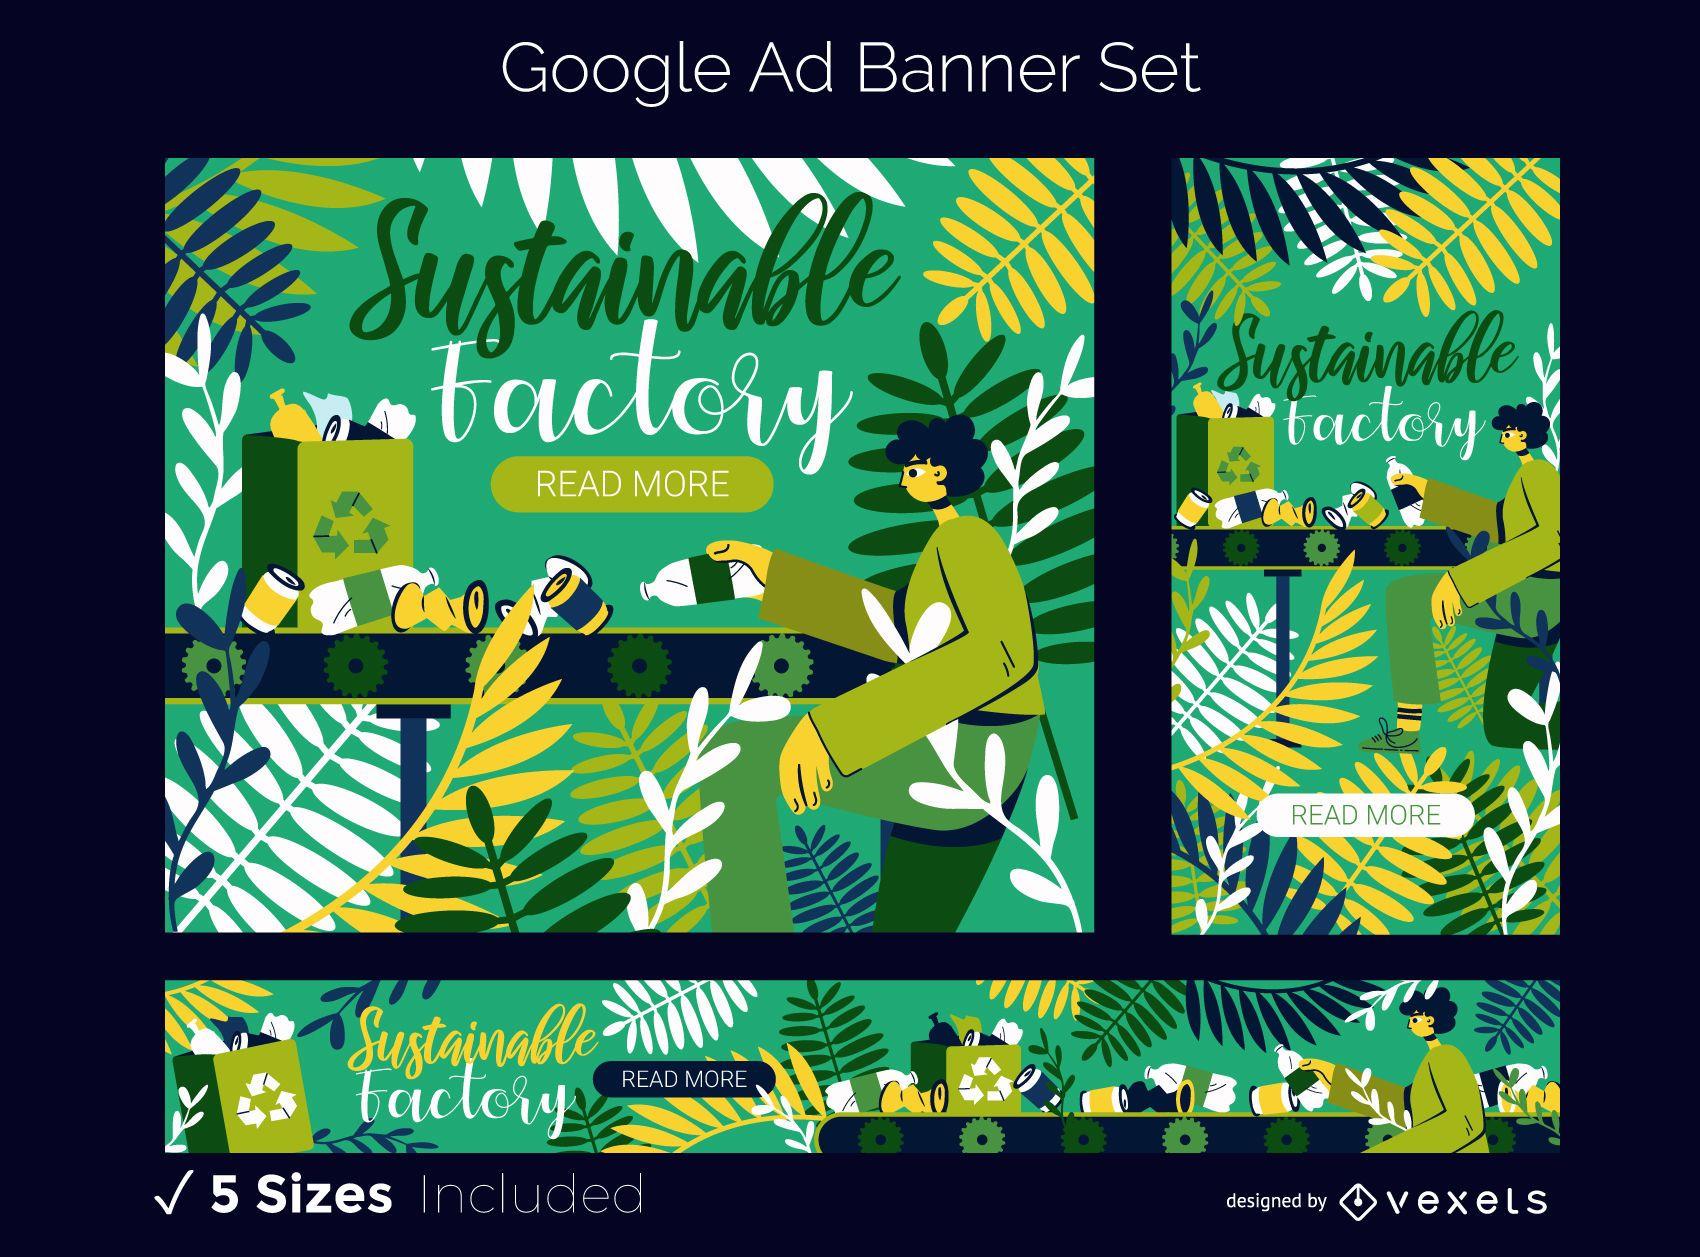 Eco Factory Google Ad Banner Set